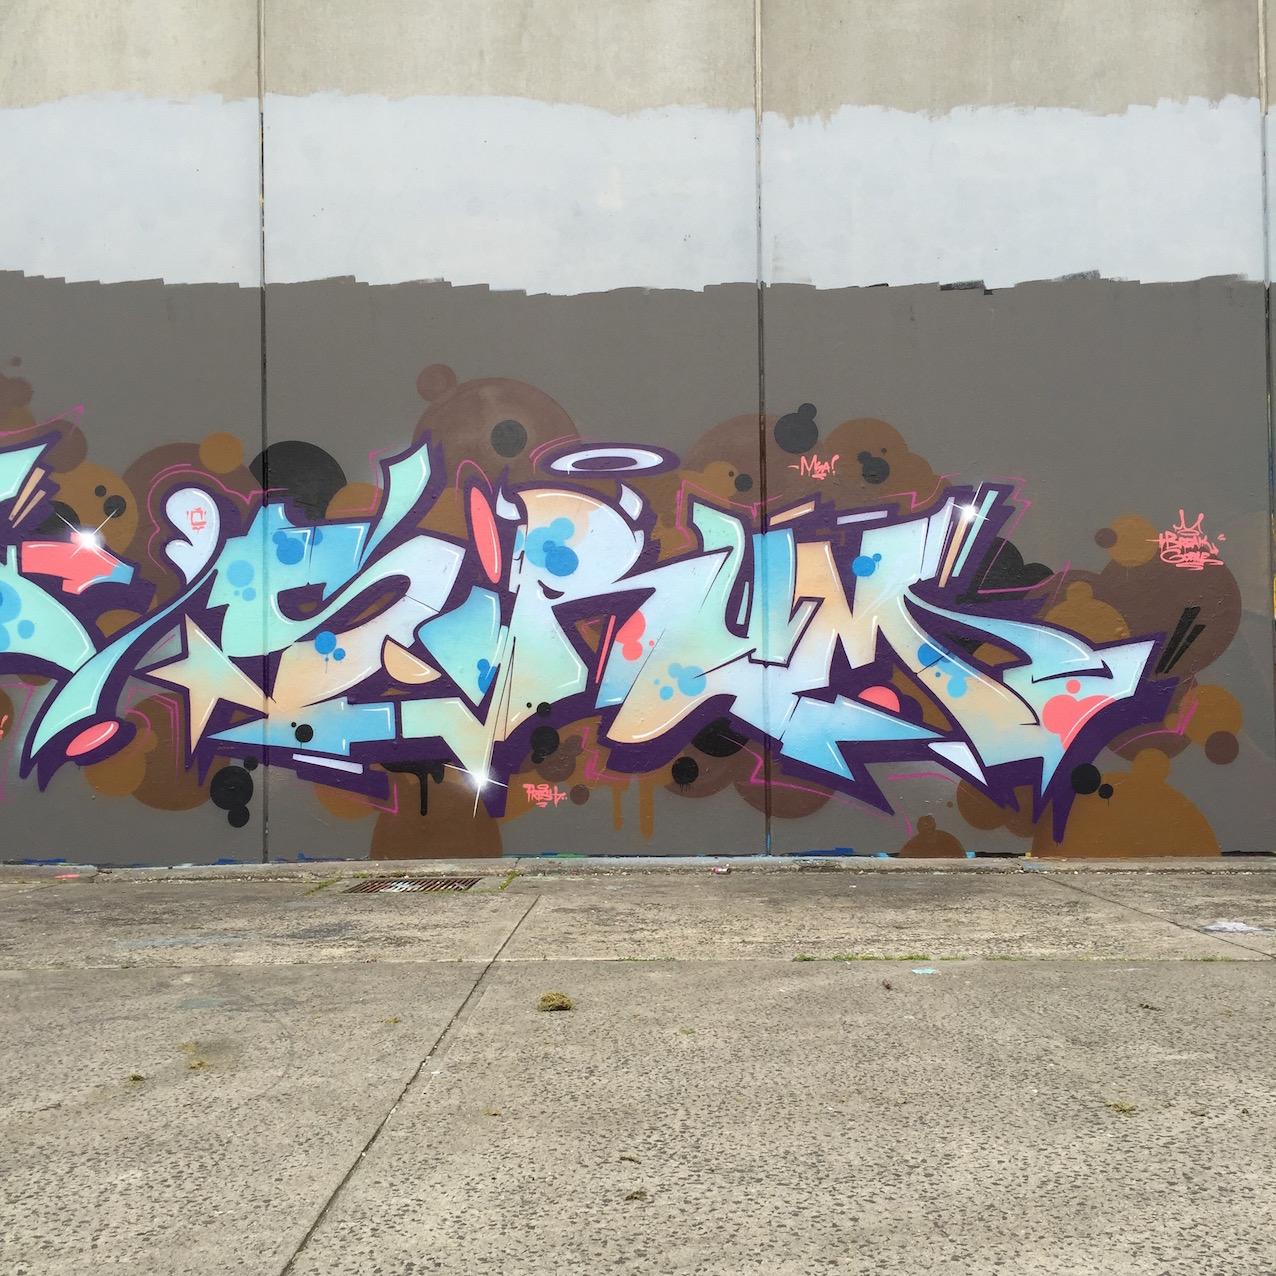 deansunshine_landofsunshine_melbourne_streetart_graffiti_invurt top ten 52 8 sirum